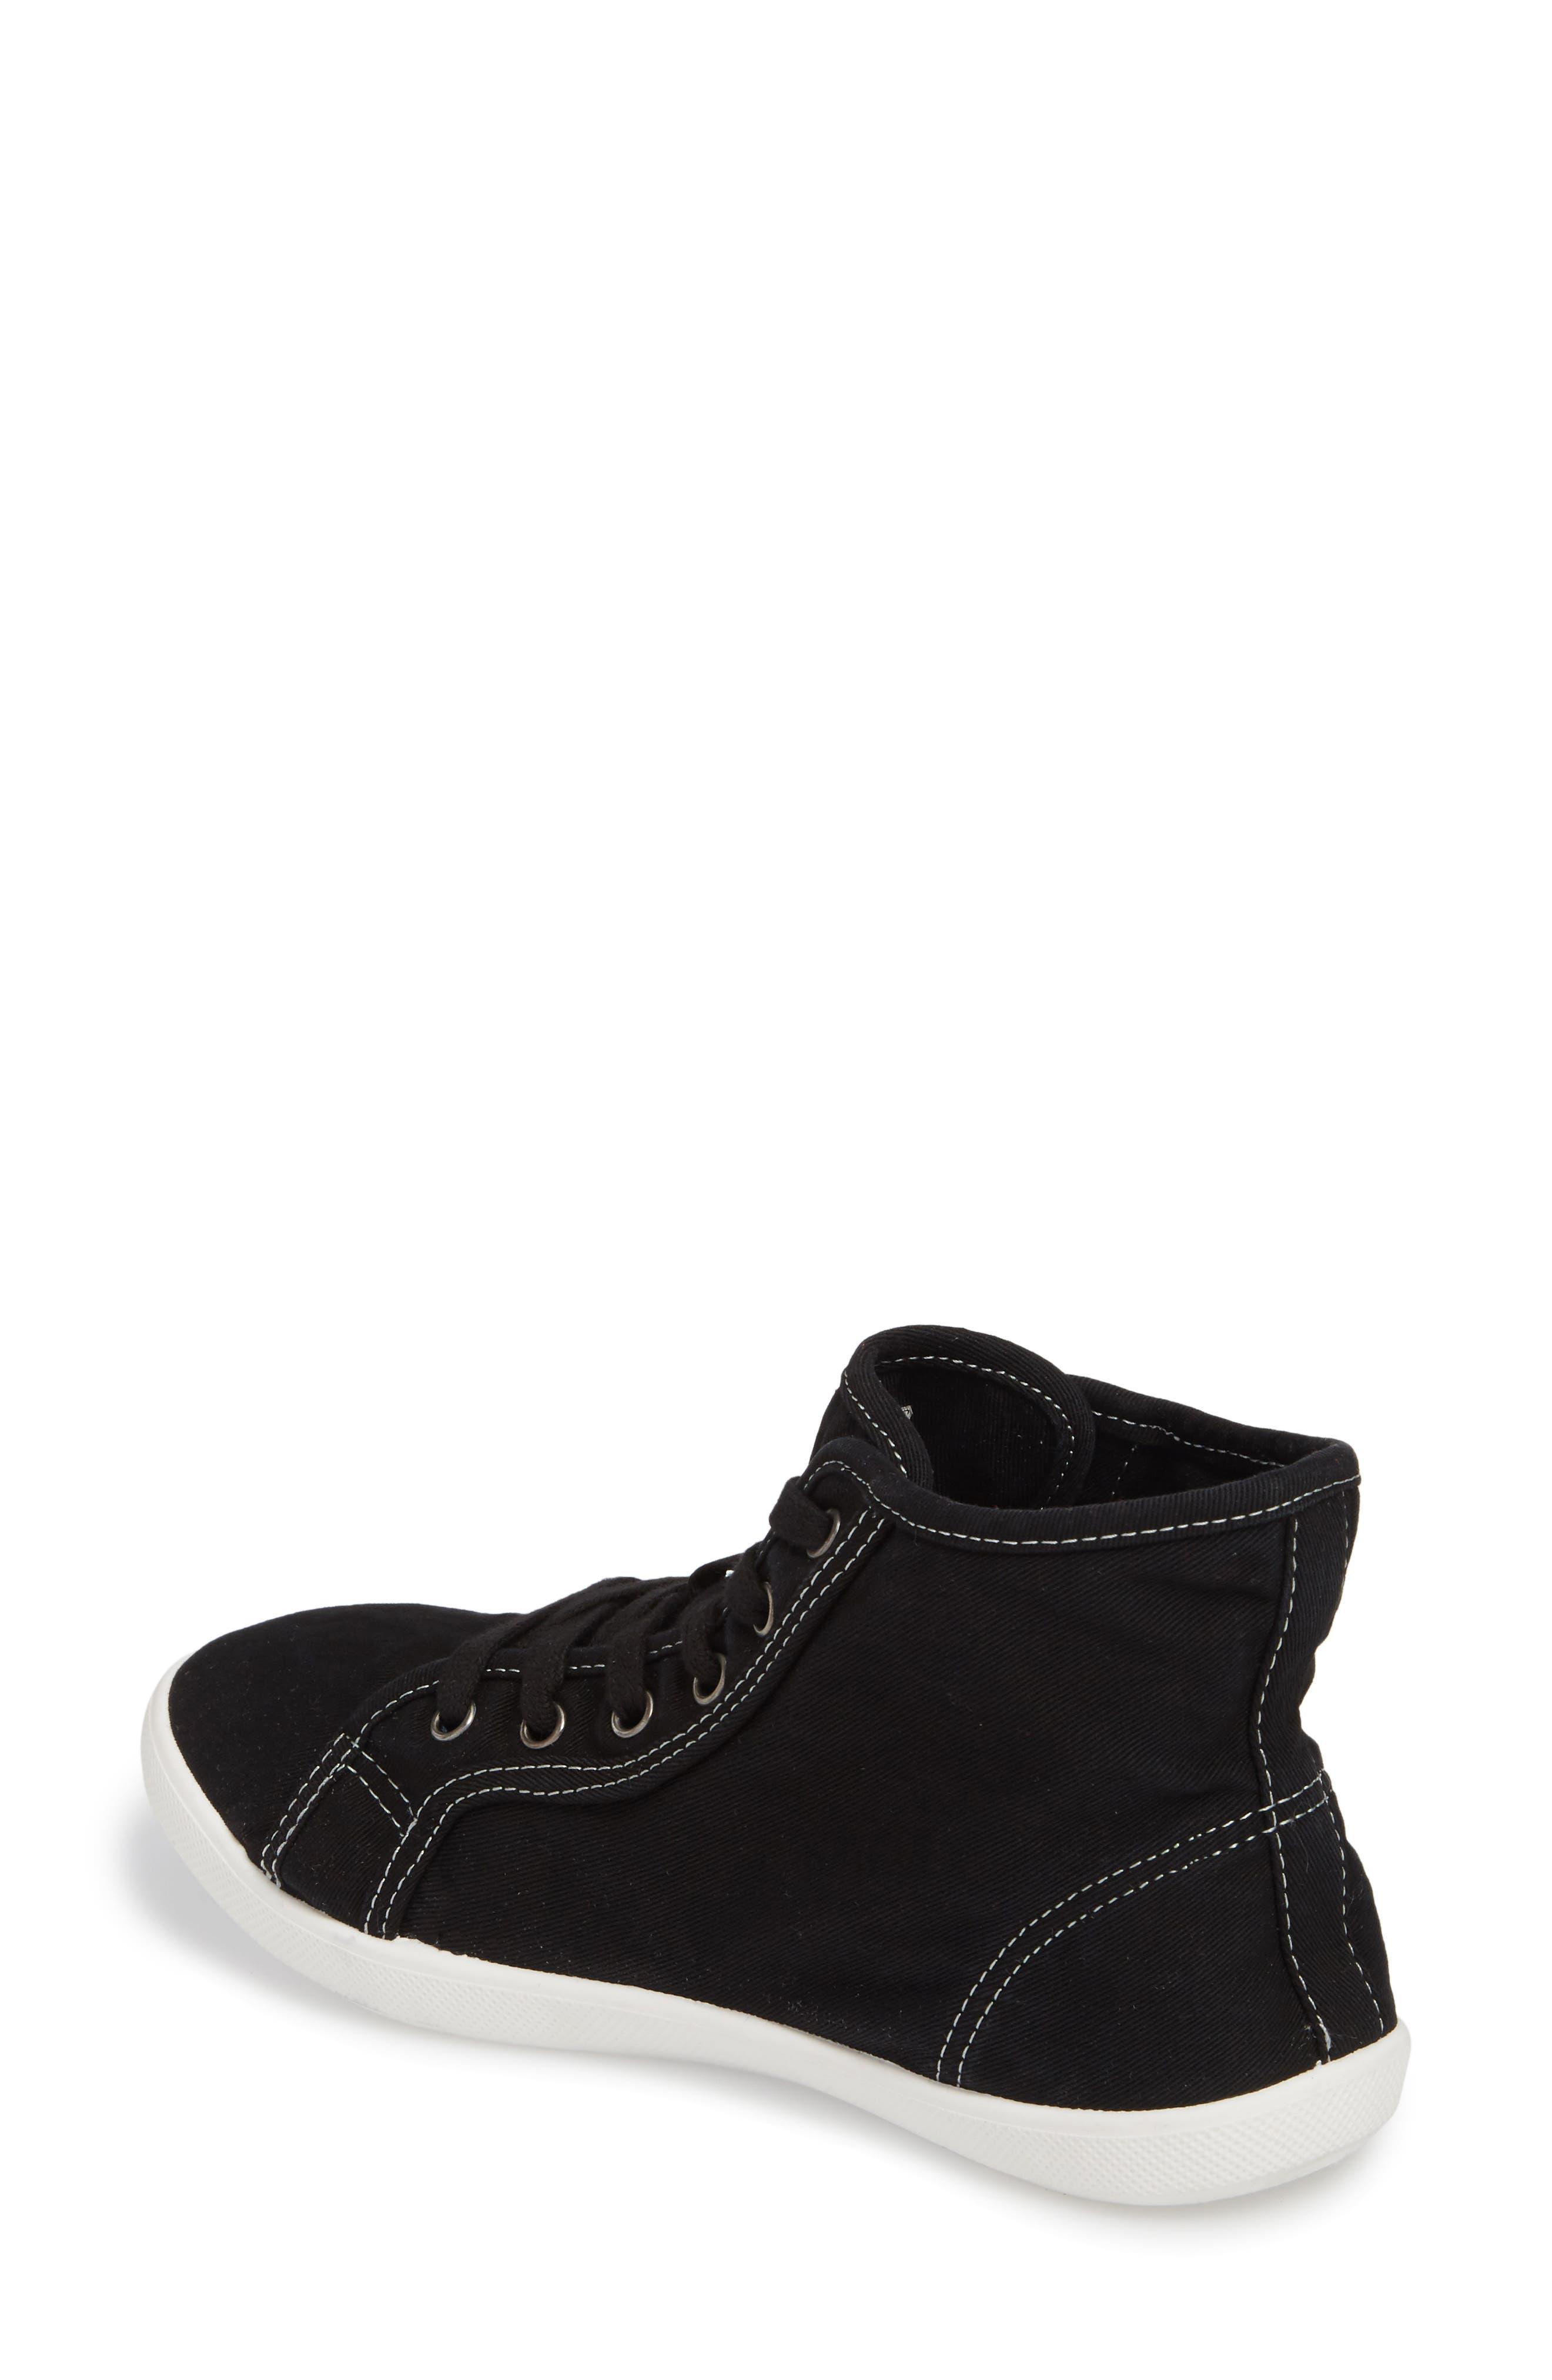 Phoenix Sneaker,                             Alternate thumbnail 4, color,